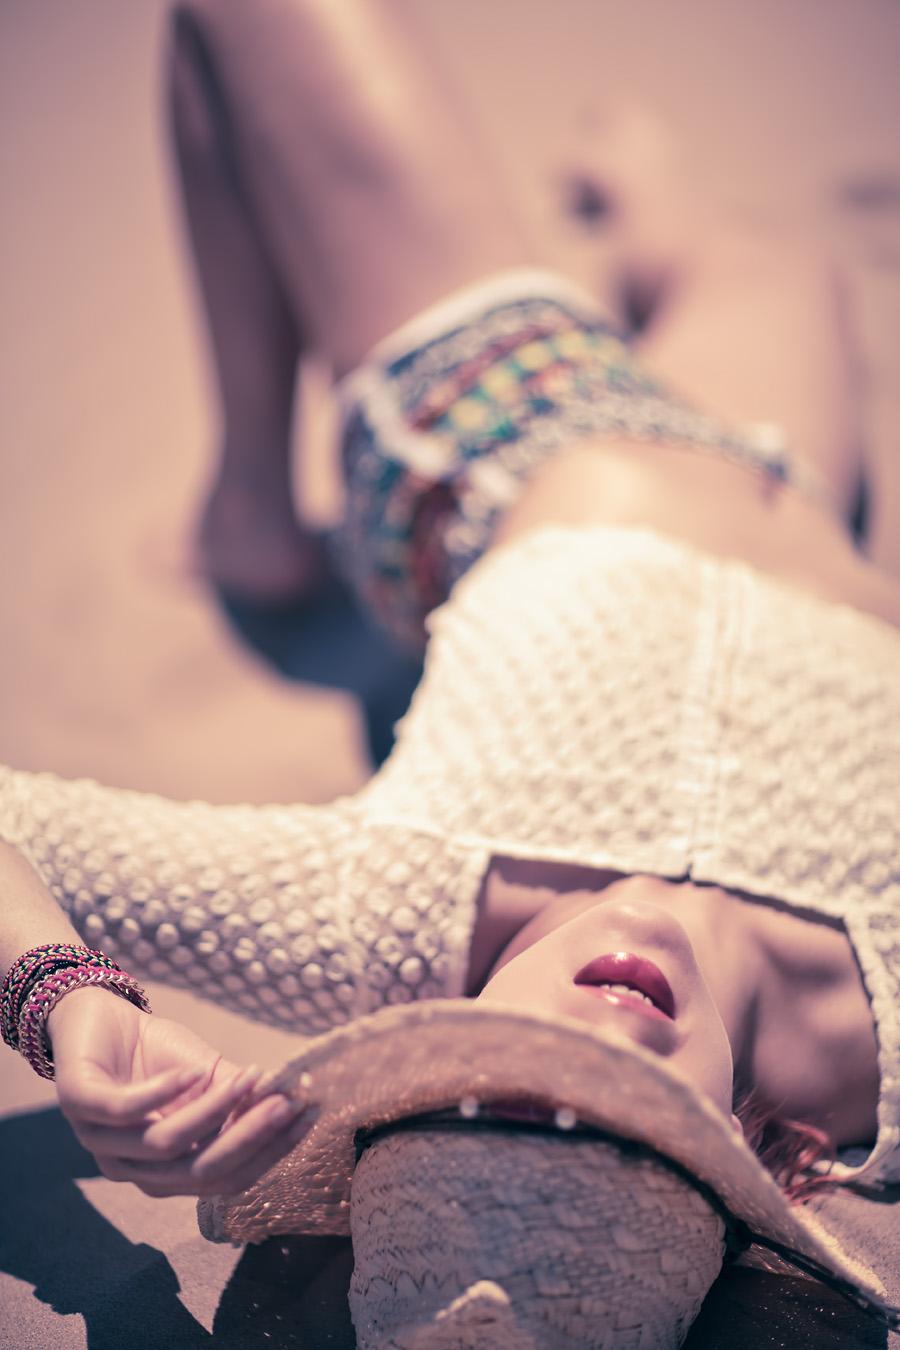 Summer Time / Photography by Russ Freeman, Model Freya, Makeup by Freya, Stylist Freya / Uploaded 26th June 2014 @ 07:49 PM